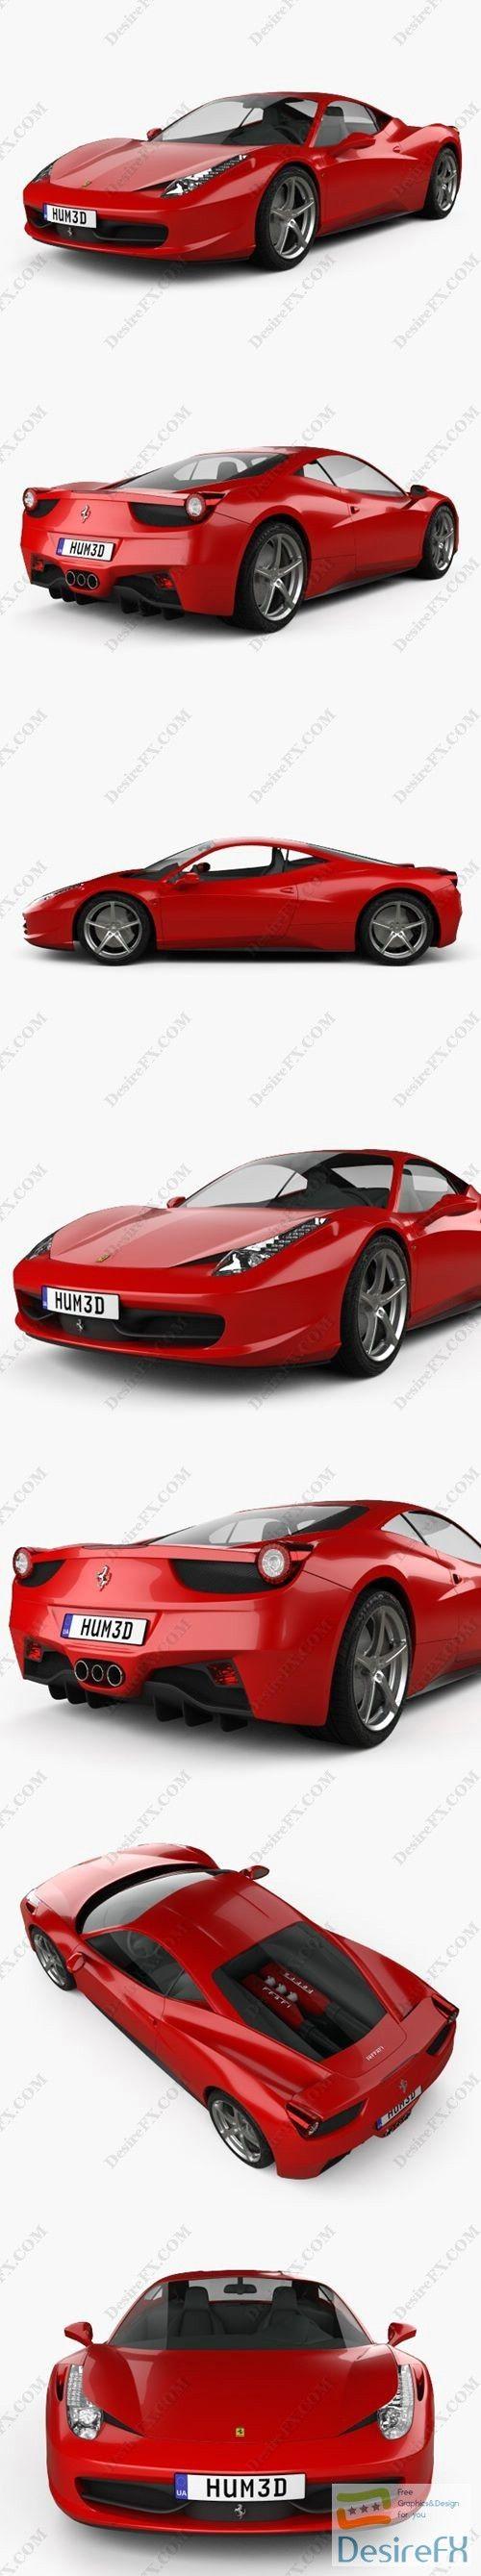 Ferrari 458 Italia 2011 3D Model #ferrari458italia